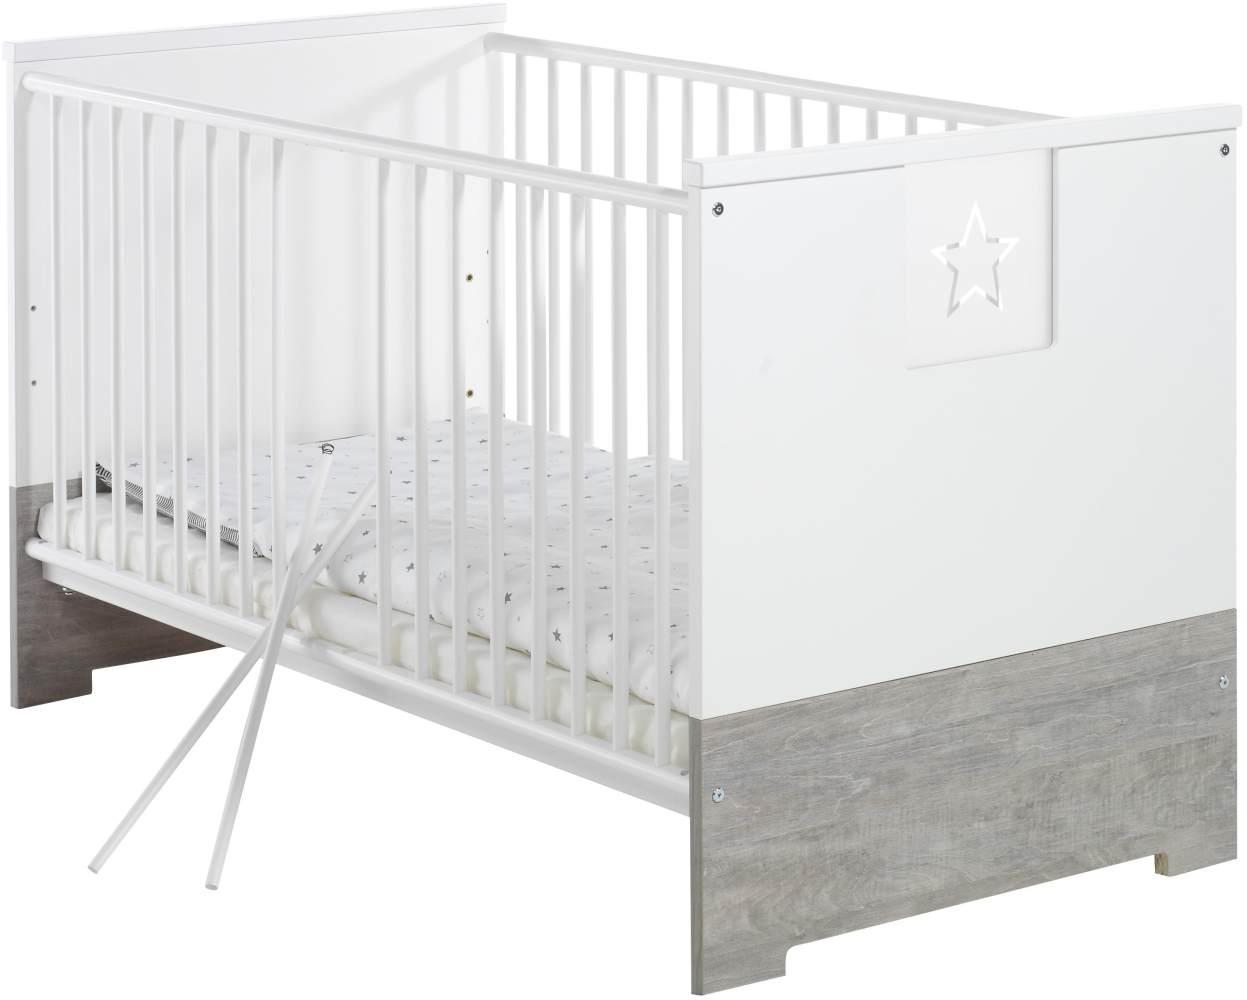 Schardt 'Eco Star' Kombi-Kinderbett weiß Bild 1